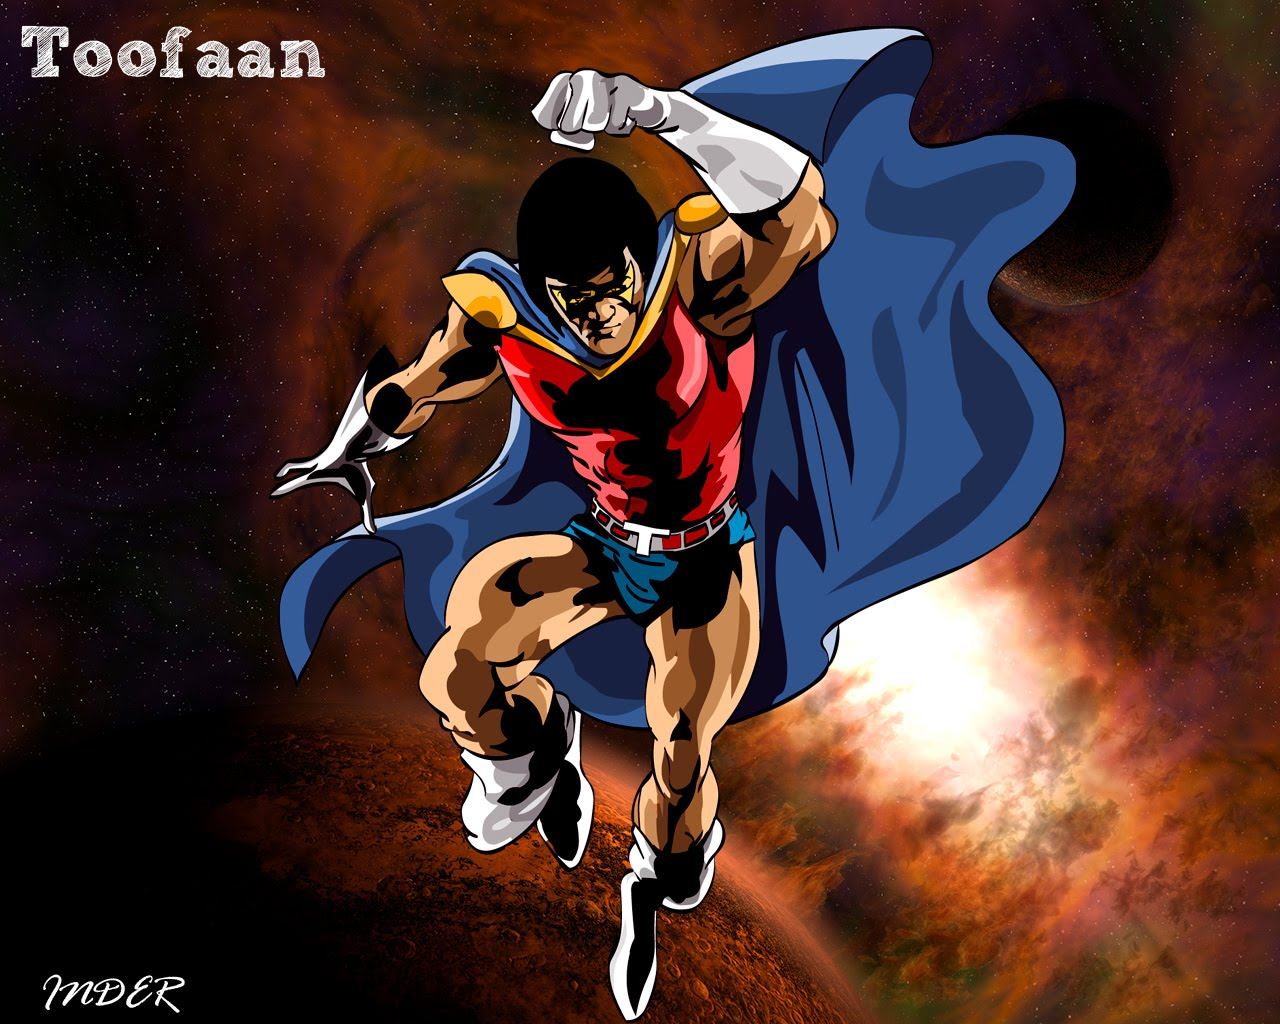 Photoshop work: Superhero Wallpapers